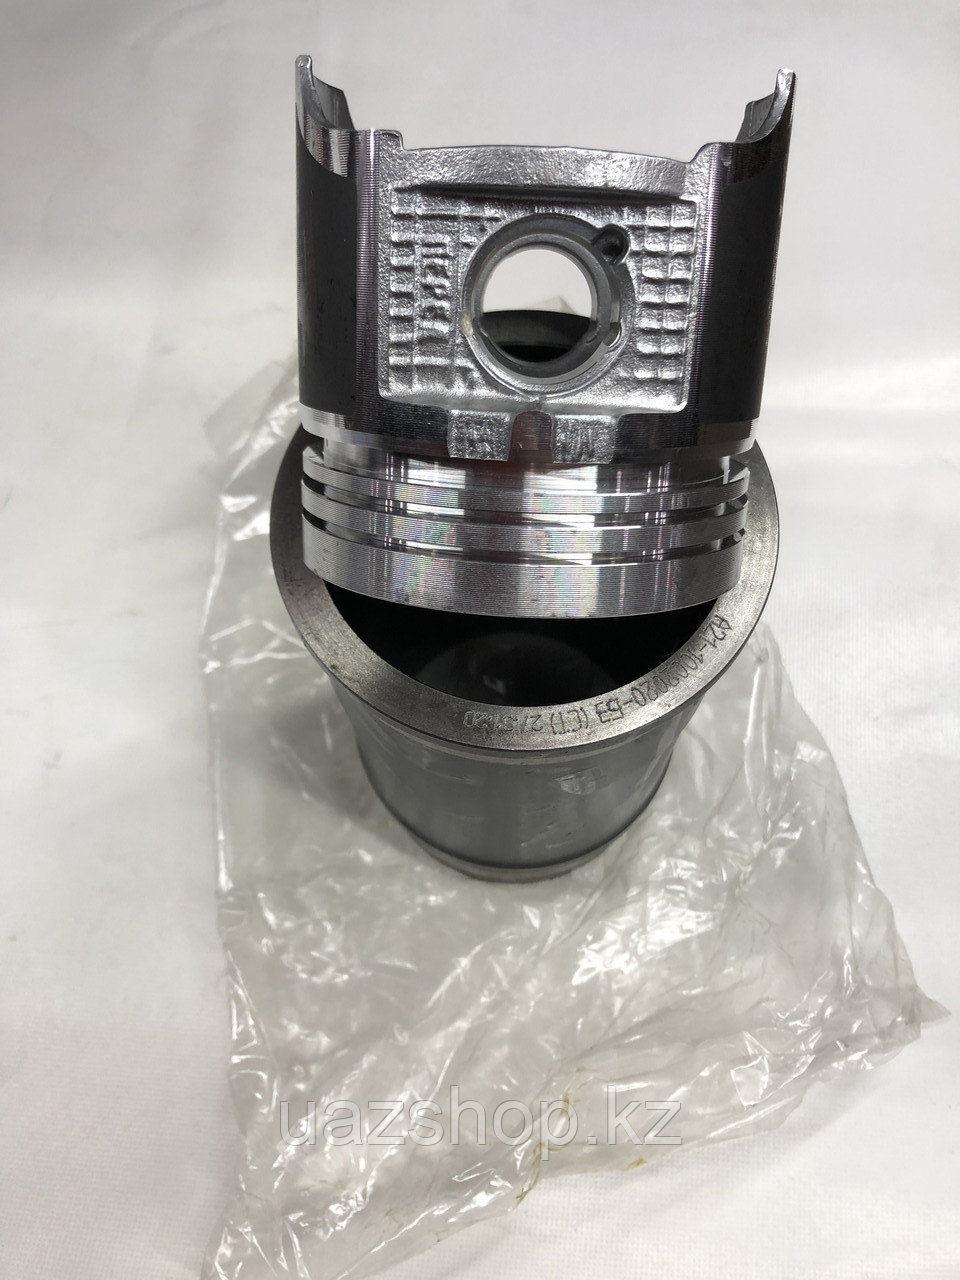 Цилиндропоршневая группа УАЗ 92.0